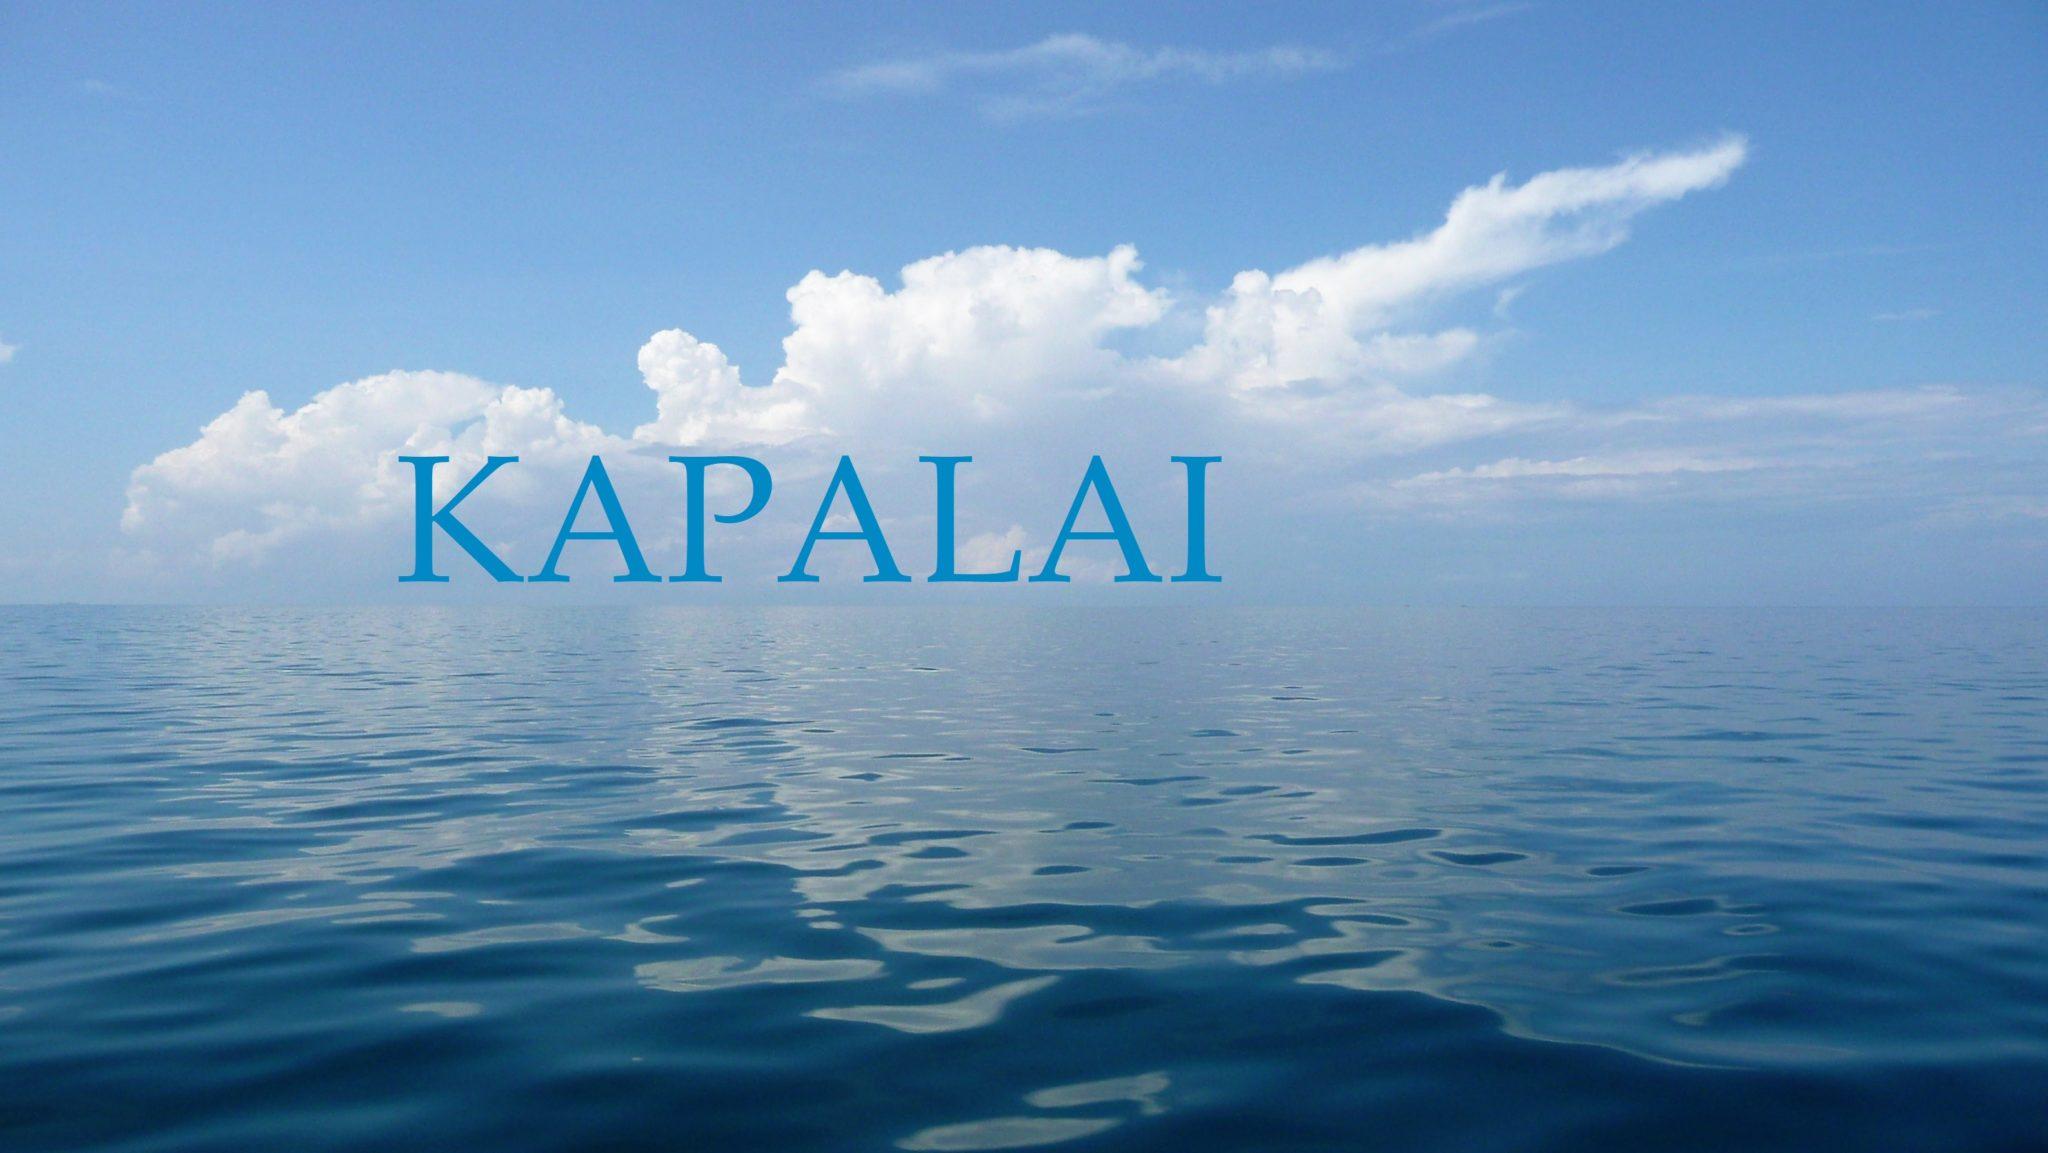 The Sipadan Kapalai Dive Resort in the Celebes Sea